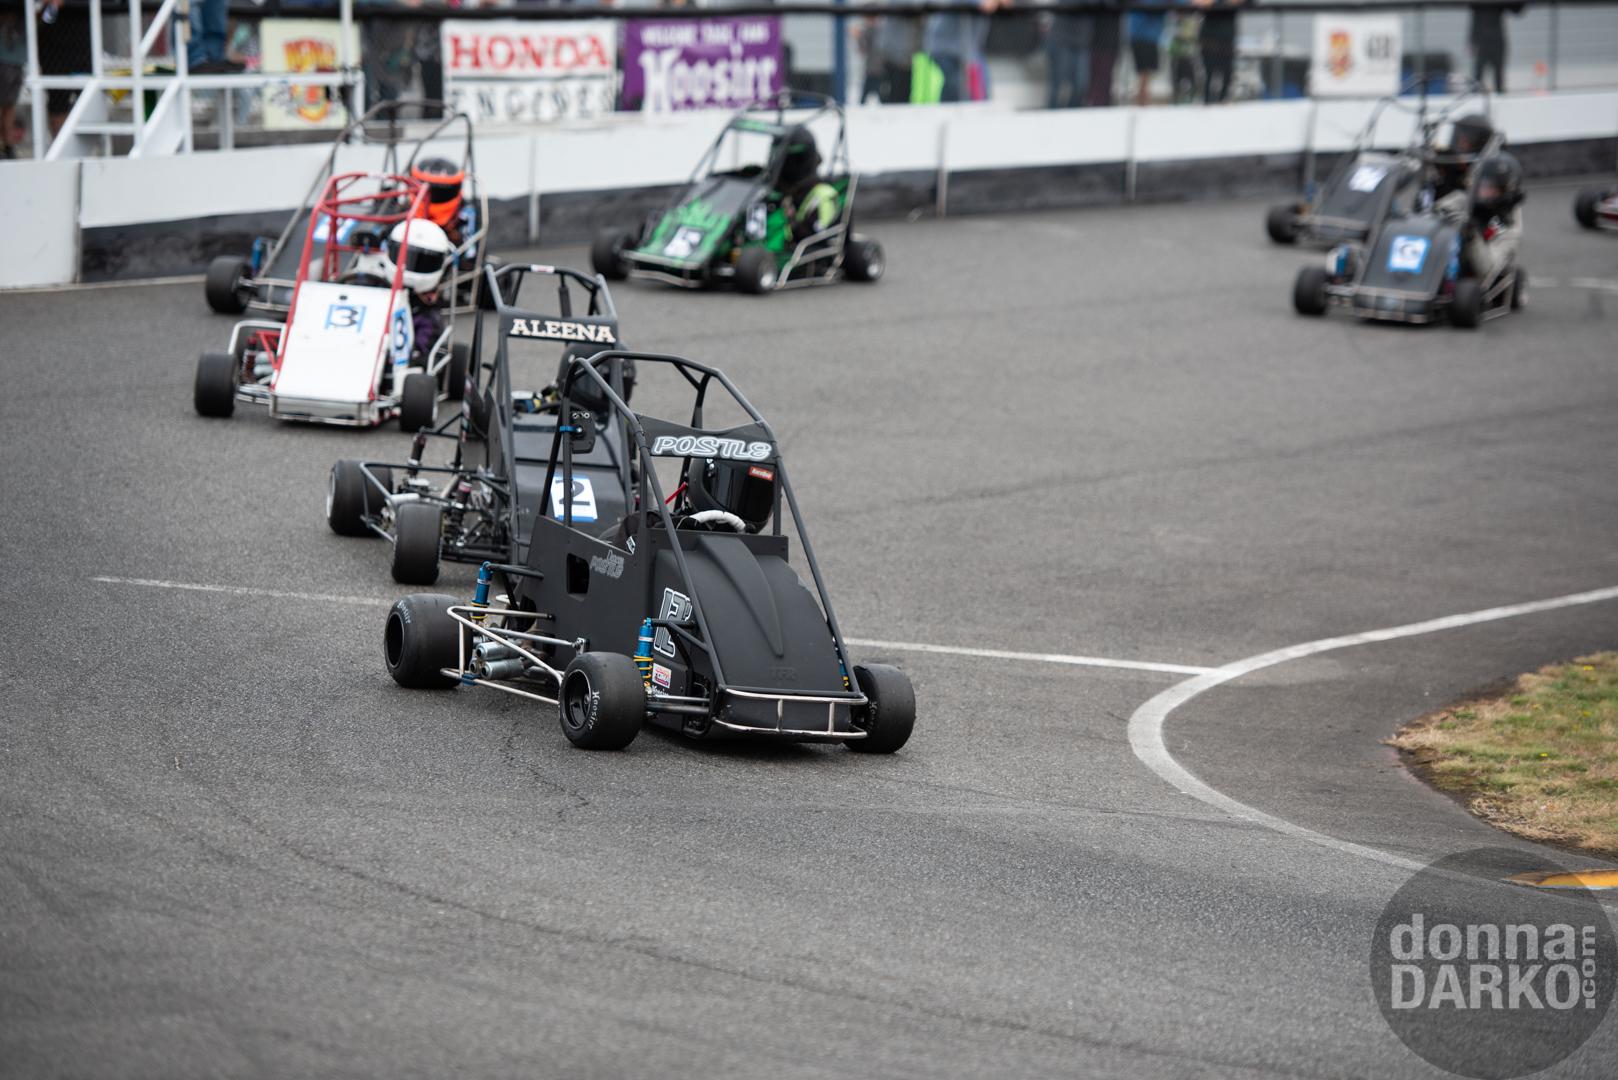 QWMA (Racing) 8-11-2019 DSC_6592.jpg